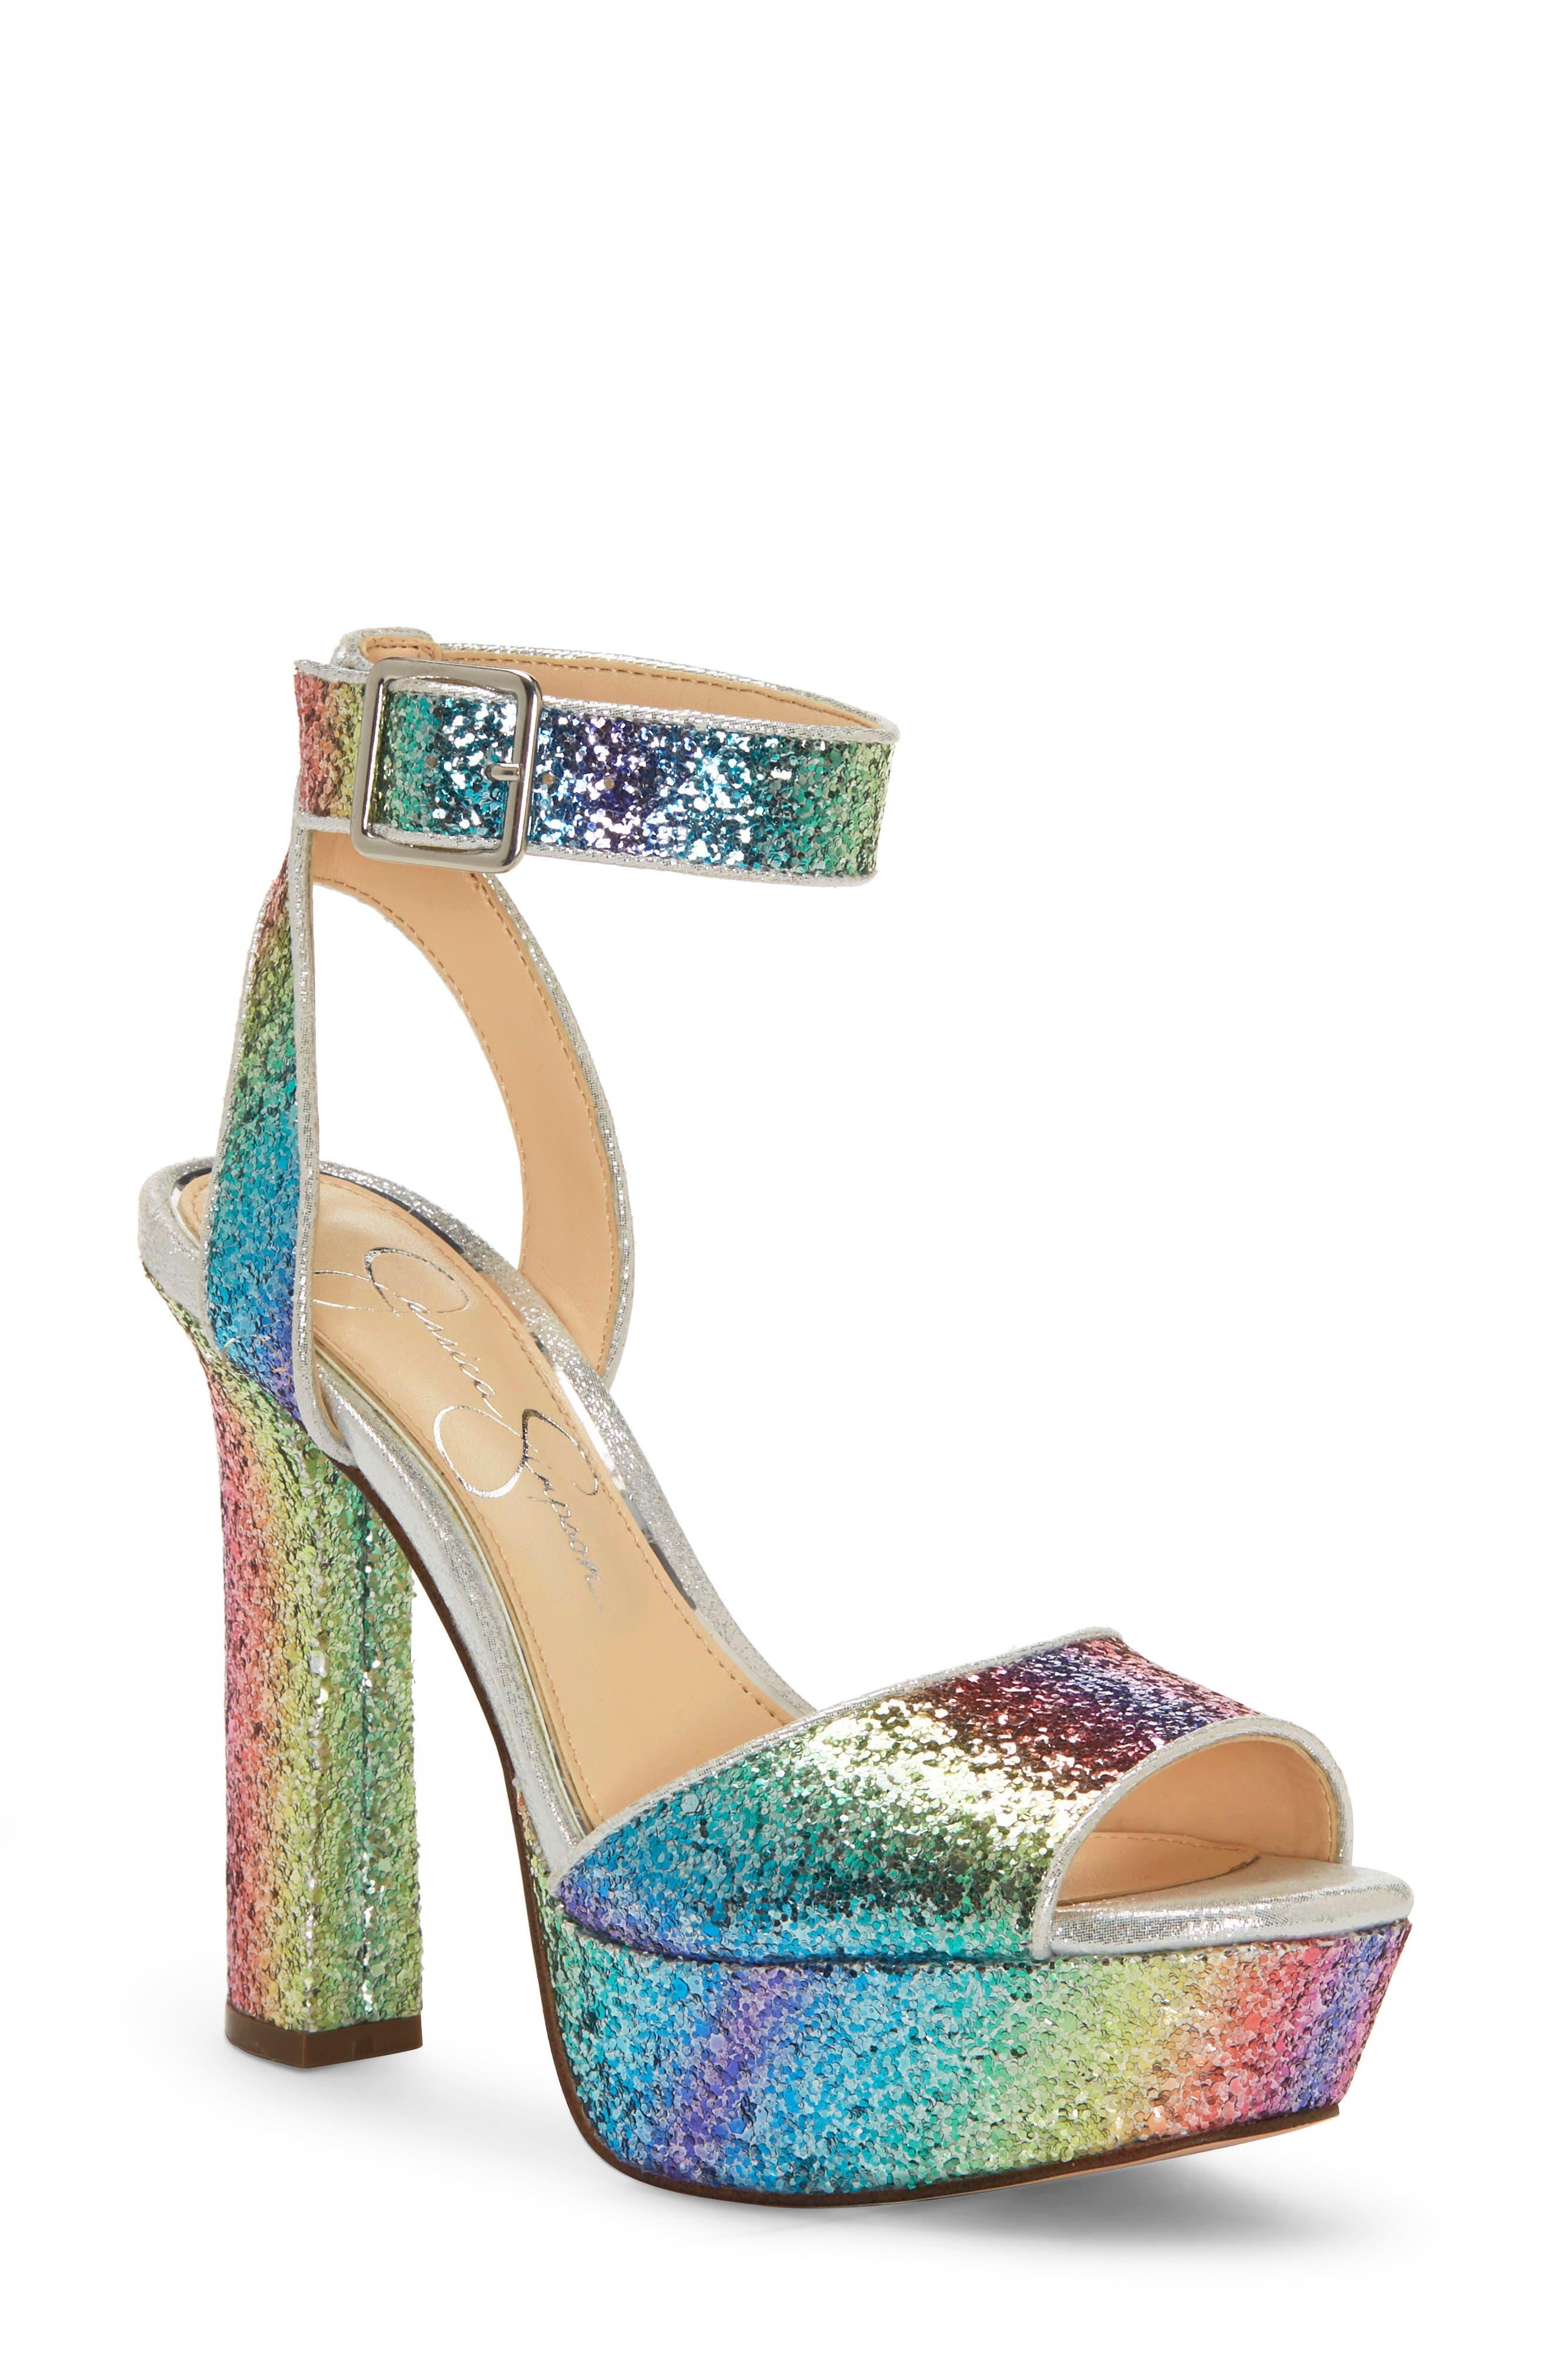 70s Outfits – 70s Style Ideas for Women Womens Jessica Simpson Maicie Platform Sandal Size 9 M - Brown $88.95 AT vintagedancer.com